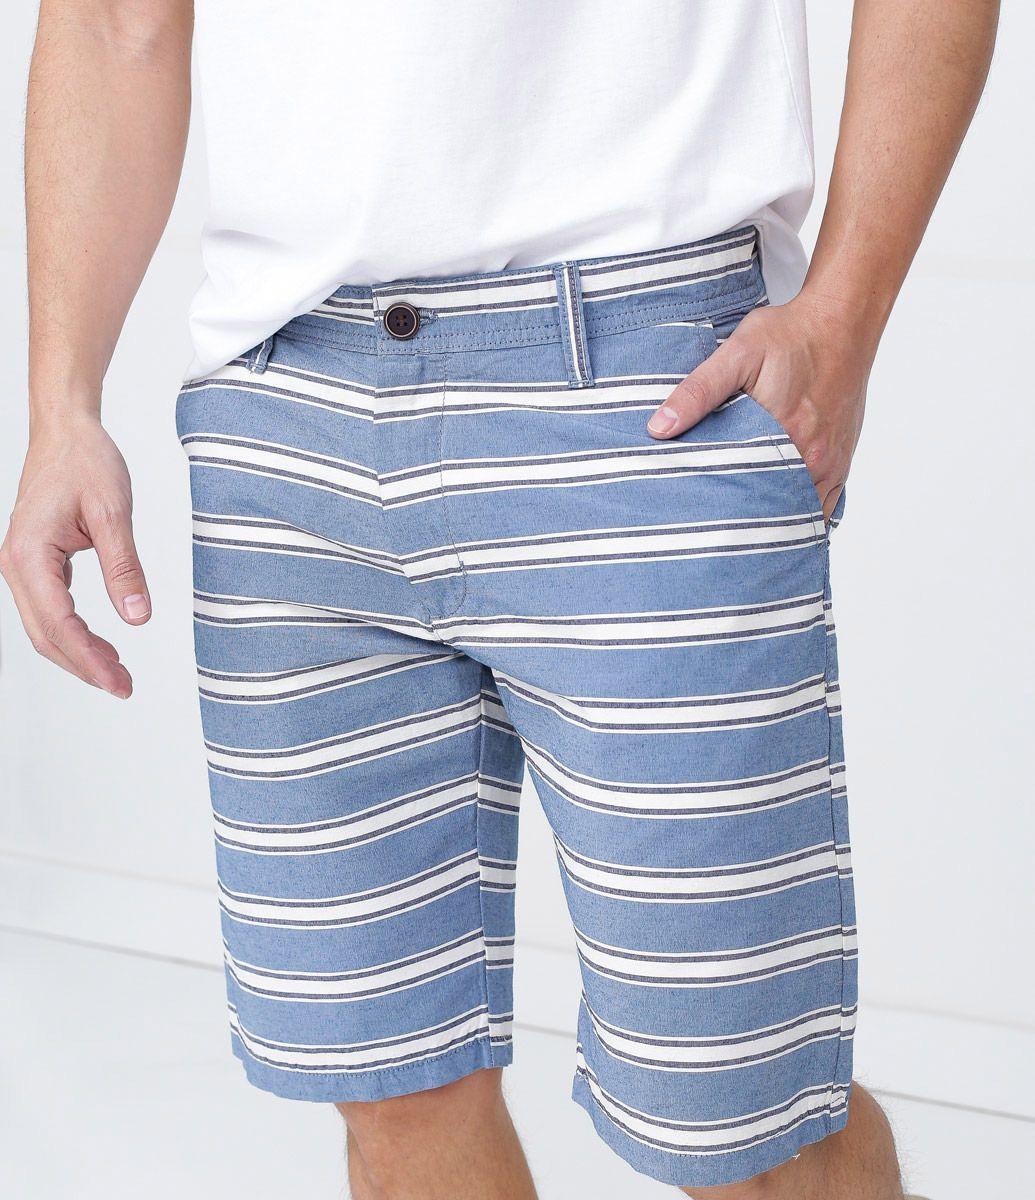 4bcca0836817 Bermuda Masculina em Sarja Listrada - Lojas Renner | Moda masculina ...